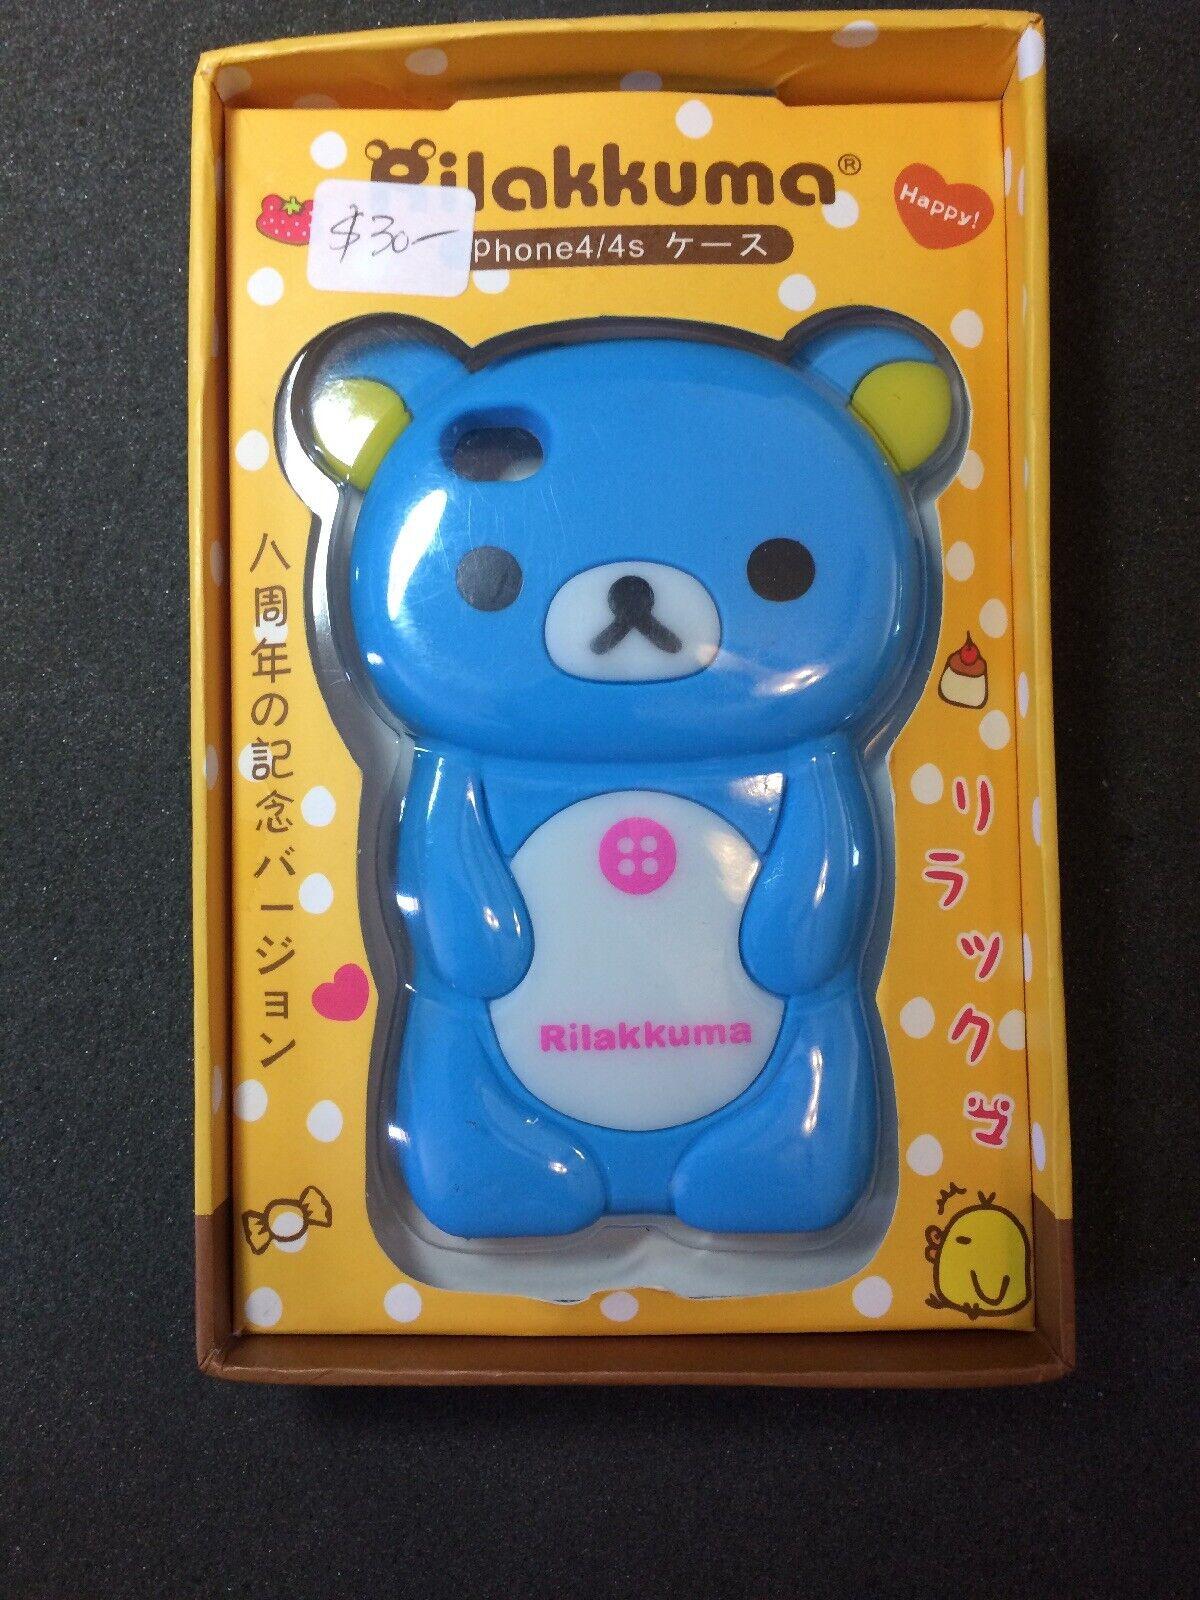 IPhone 4 4S 3D 'Rilakkuma Bear' Soft Silicone Case Cover -Blue   eBay